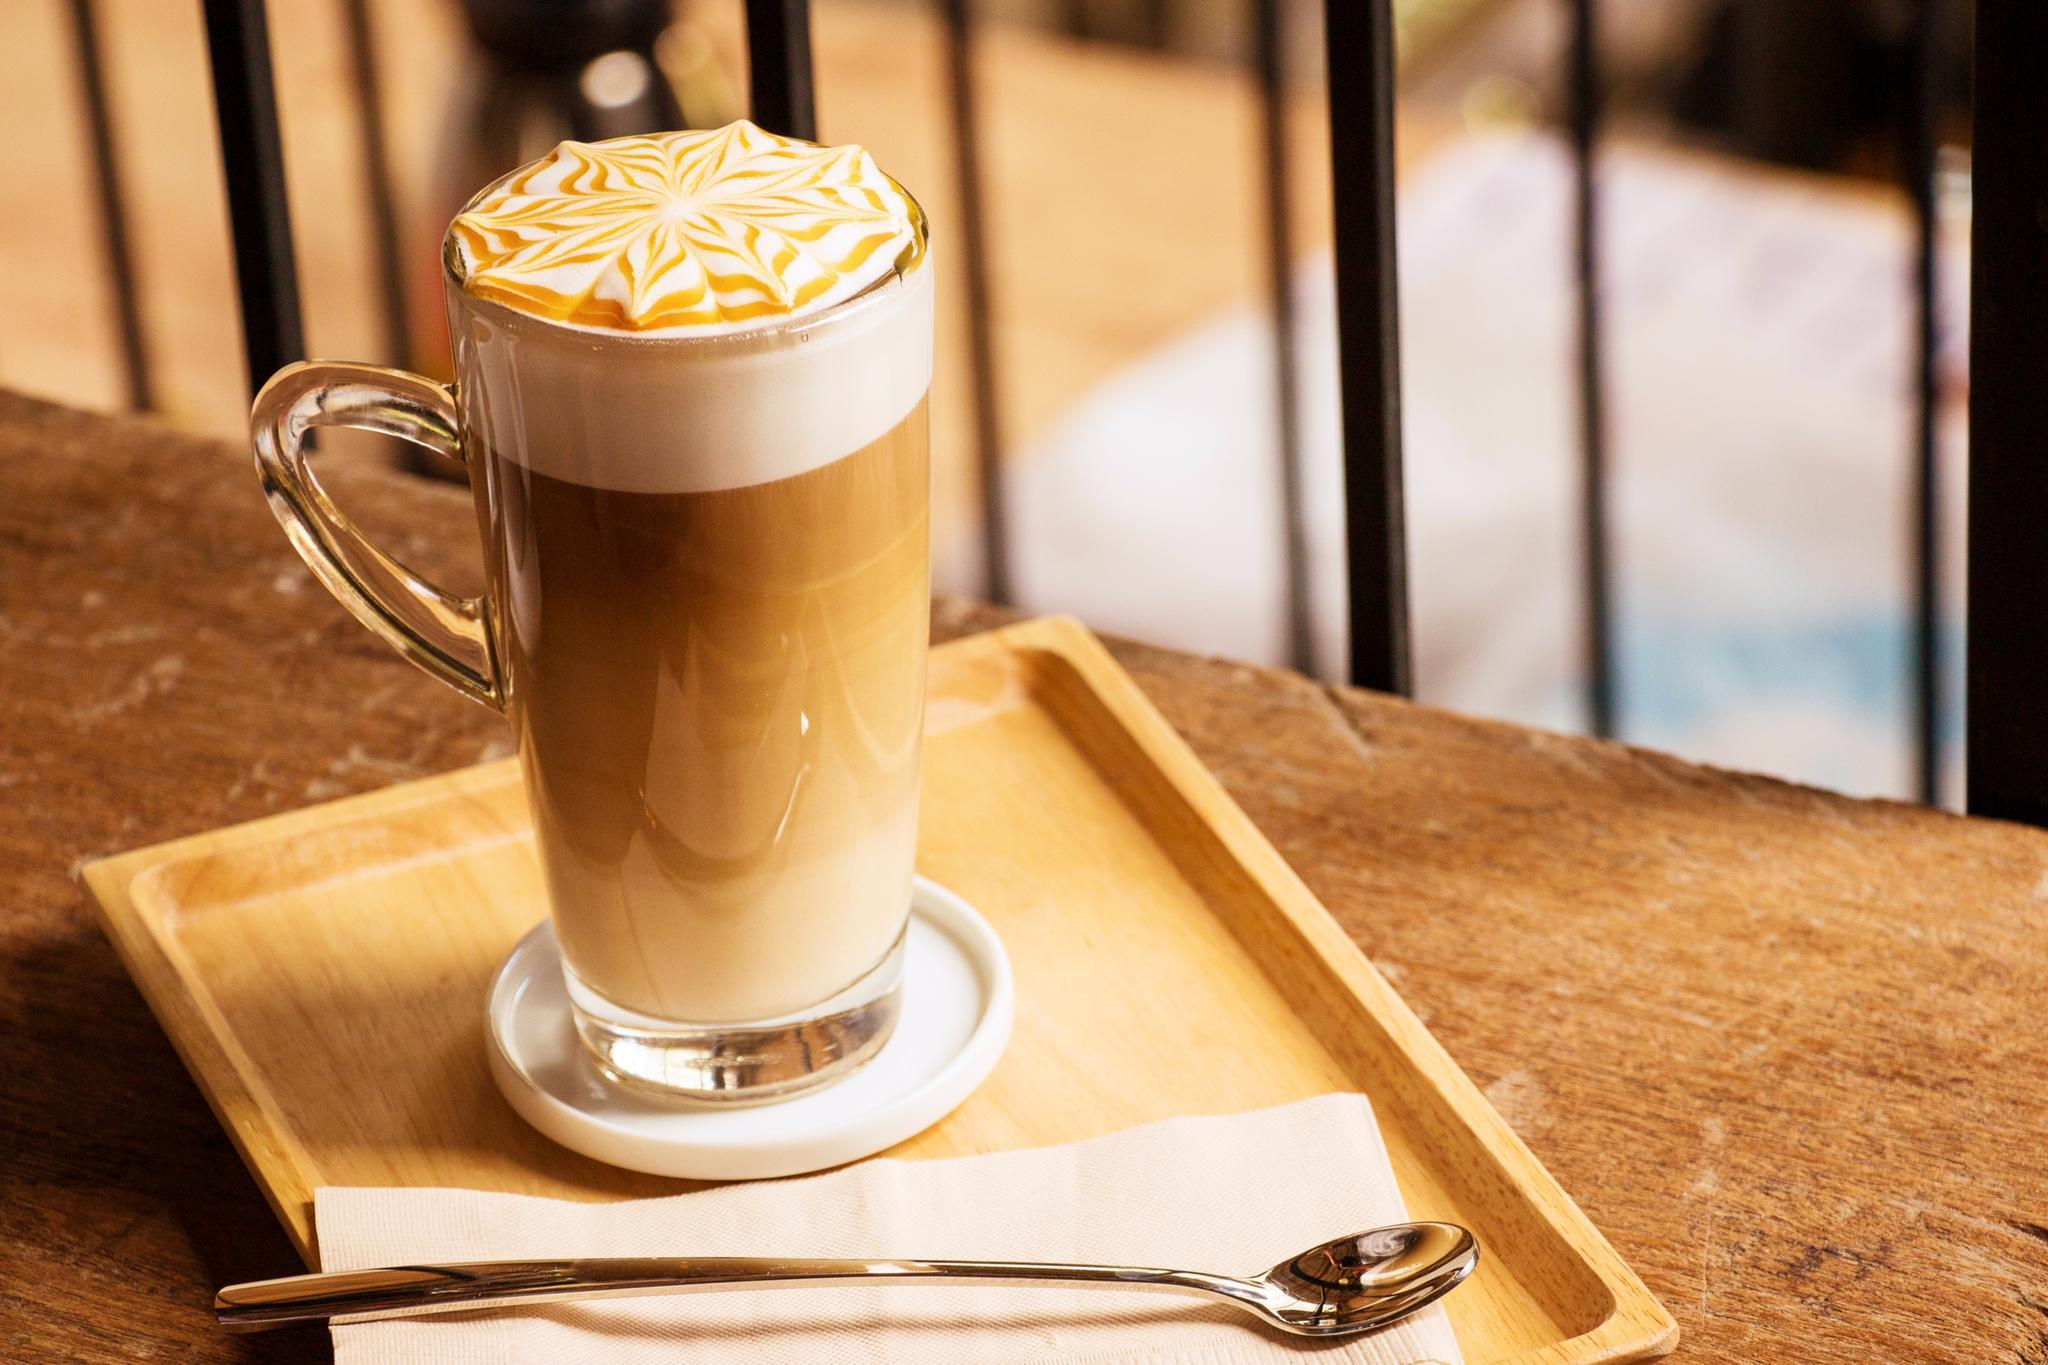 mandel-latte-macchiato (getreidekaffee)   brigitte.de